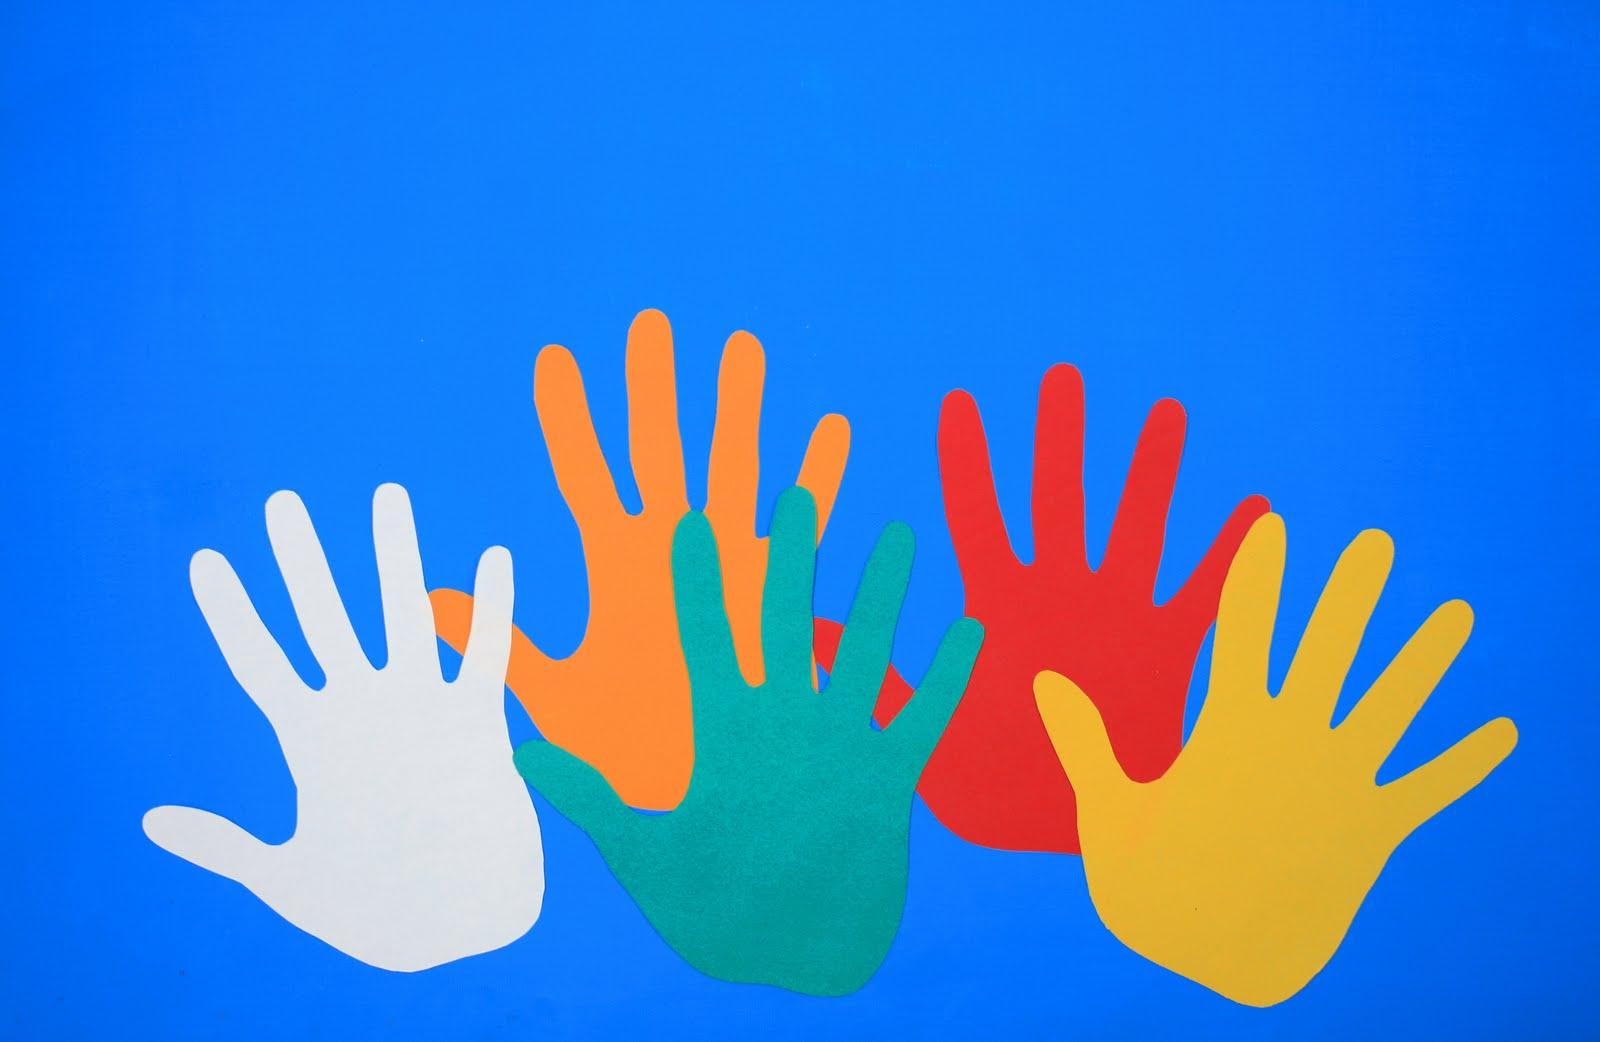 Pin Hand Waving Goodbye on Pinterest